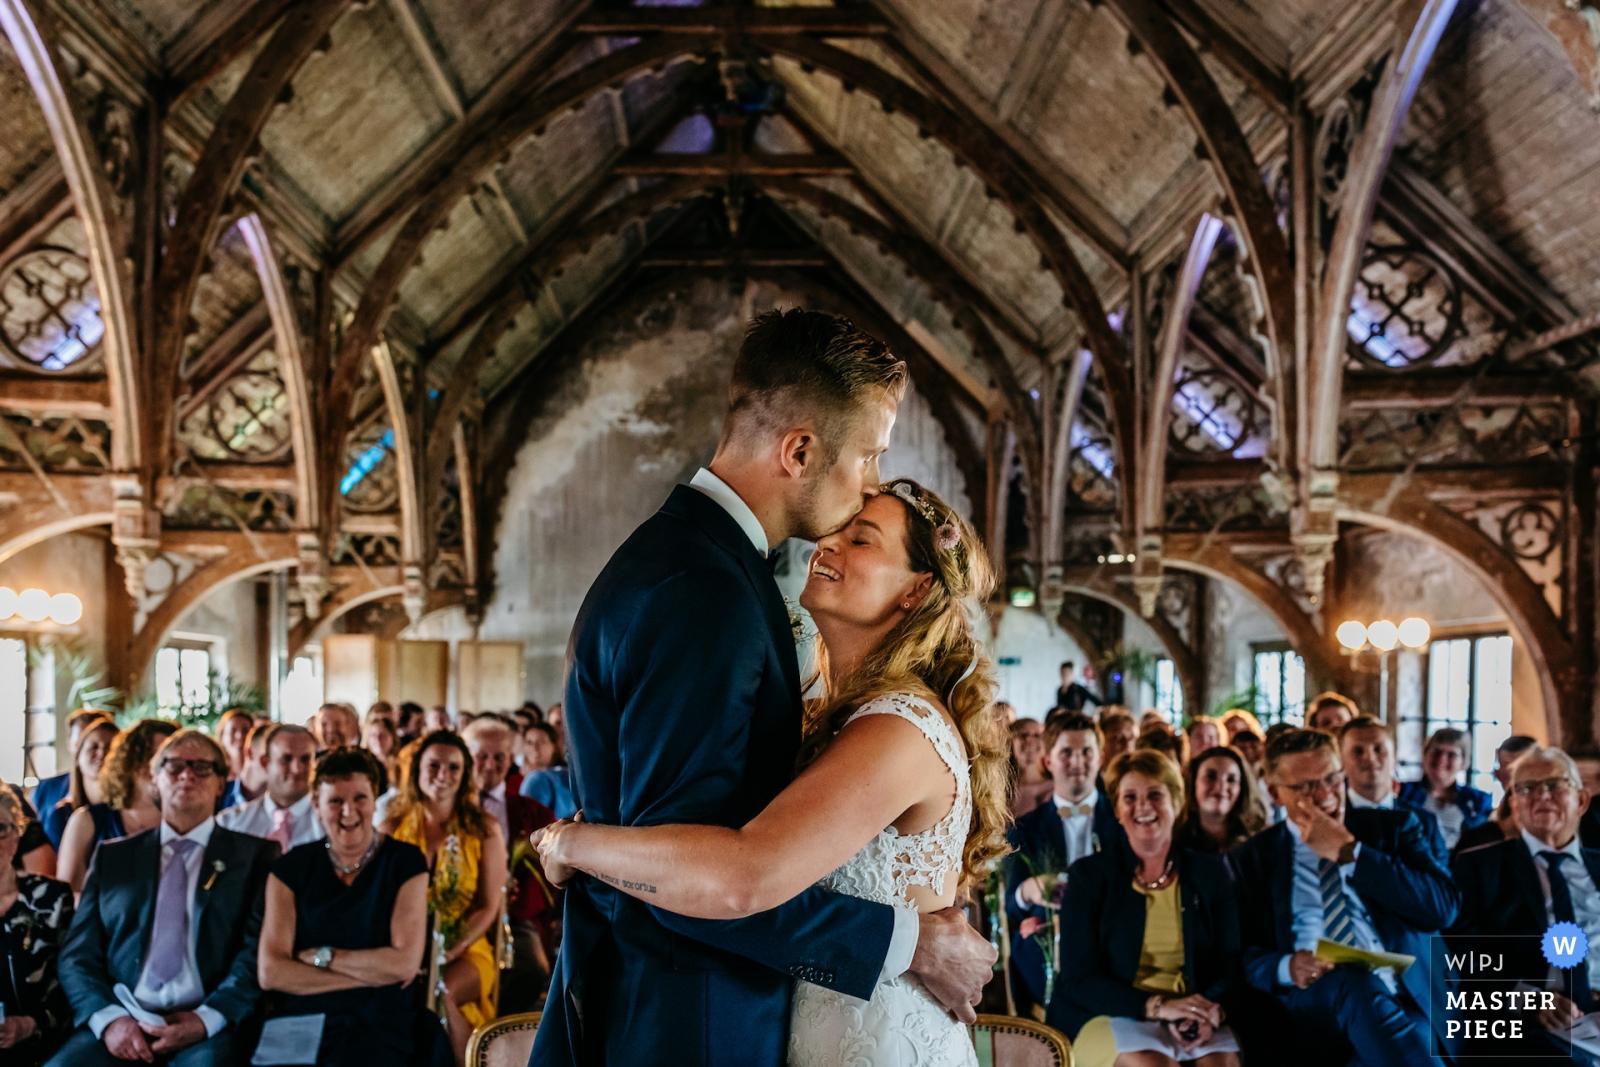 Wedding Photo Journalists Association V7 2018